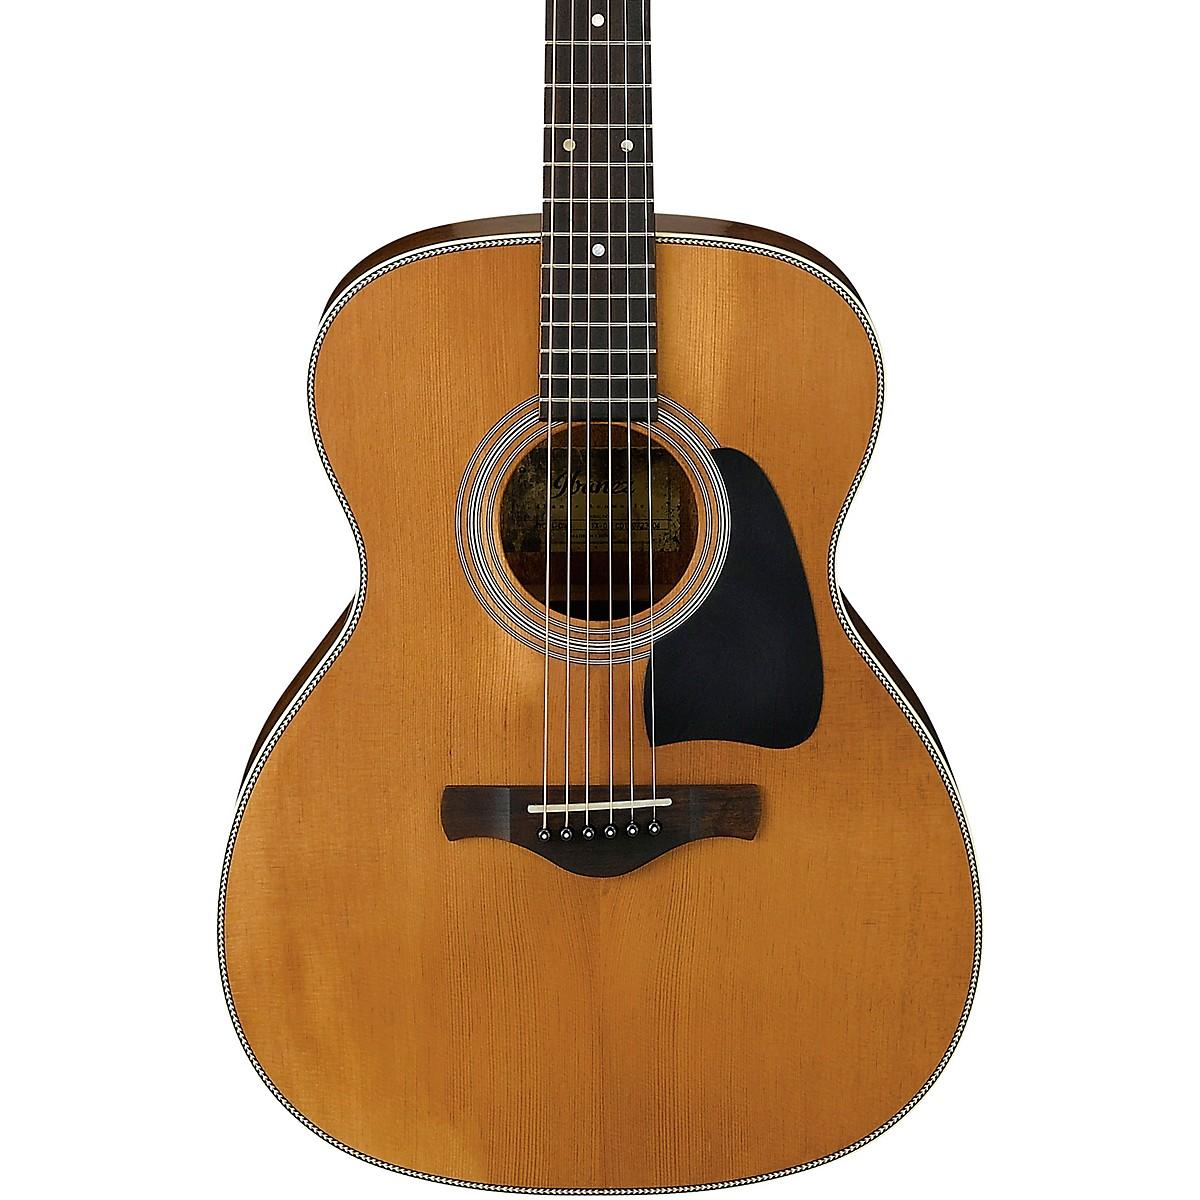 Ibanez AVC11 Artwood Vintage Grand Concert Acoustic Guitar